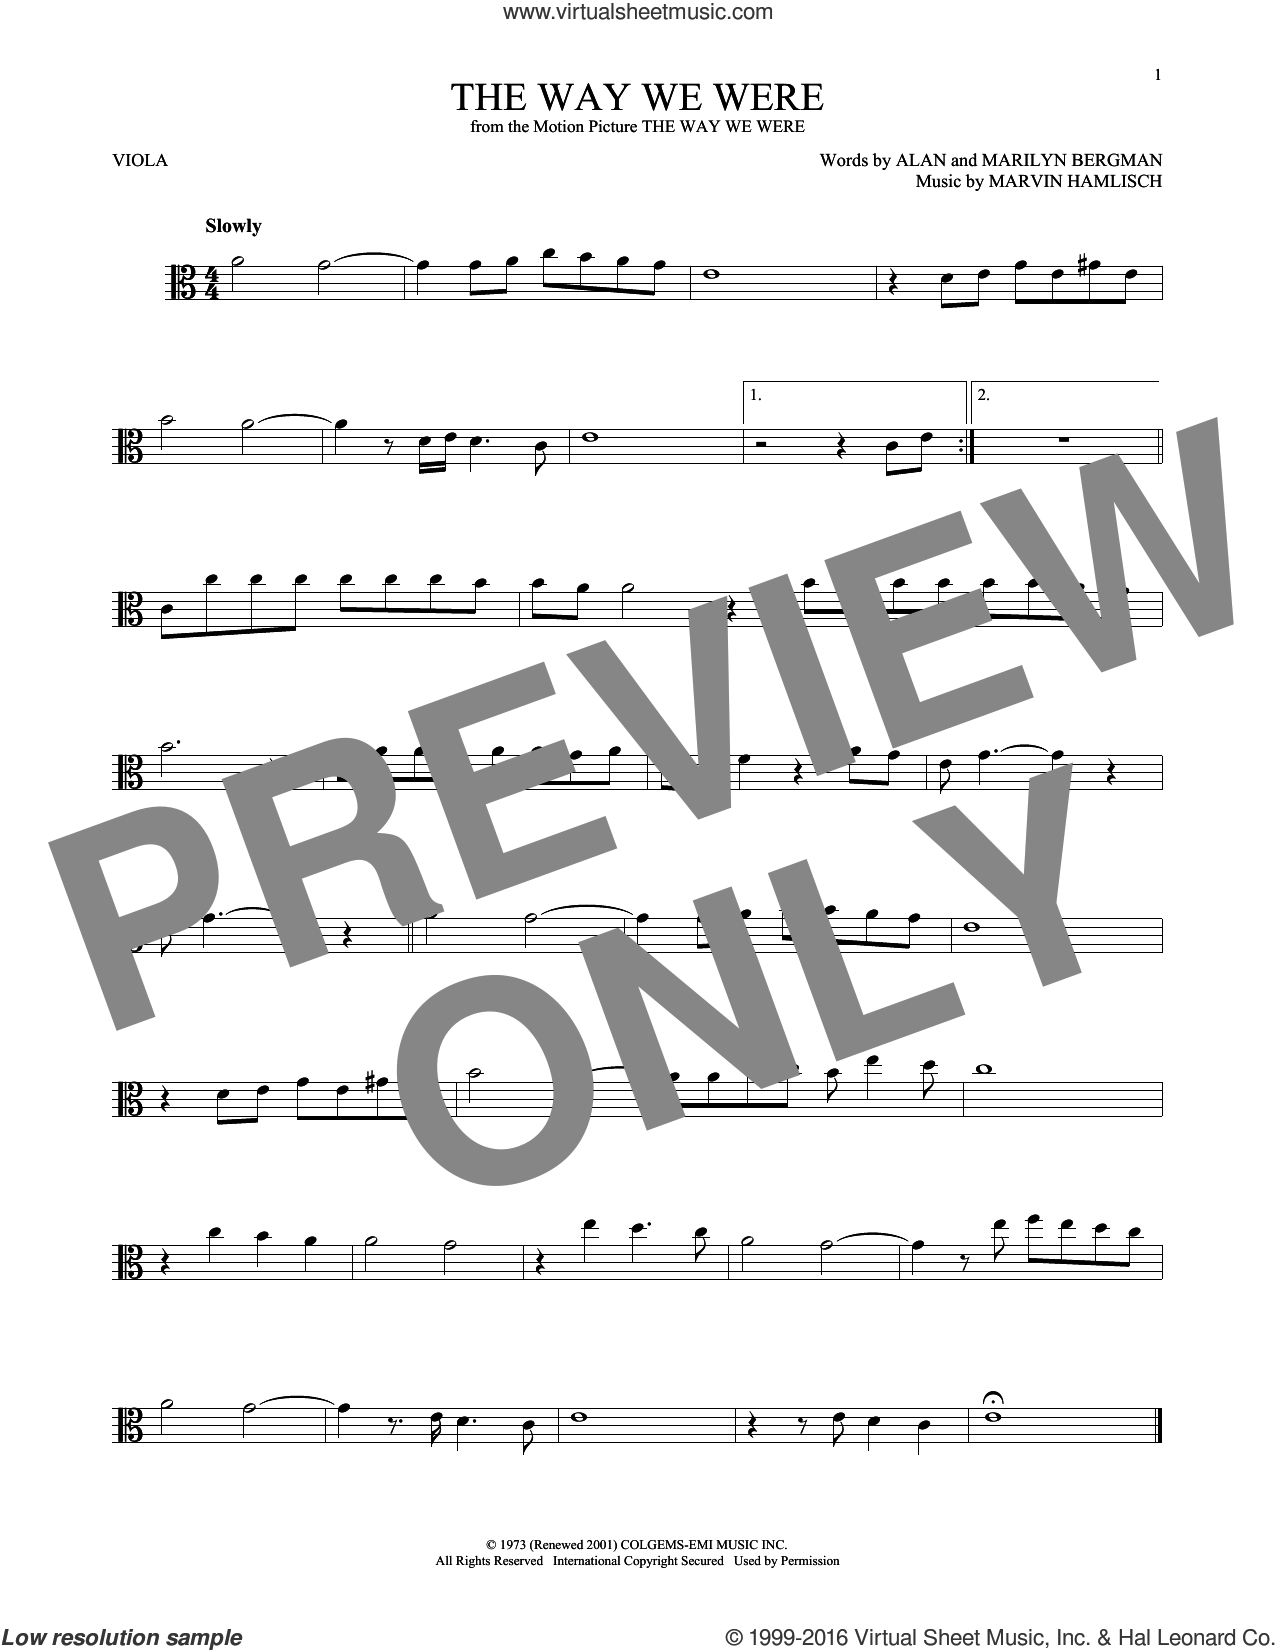 The Way We Were sheet music for viola solo by Barbra Streisand, Alan Bergman, Marilyn Bergman and Marvin Hamlisch, intermediate skill level